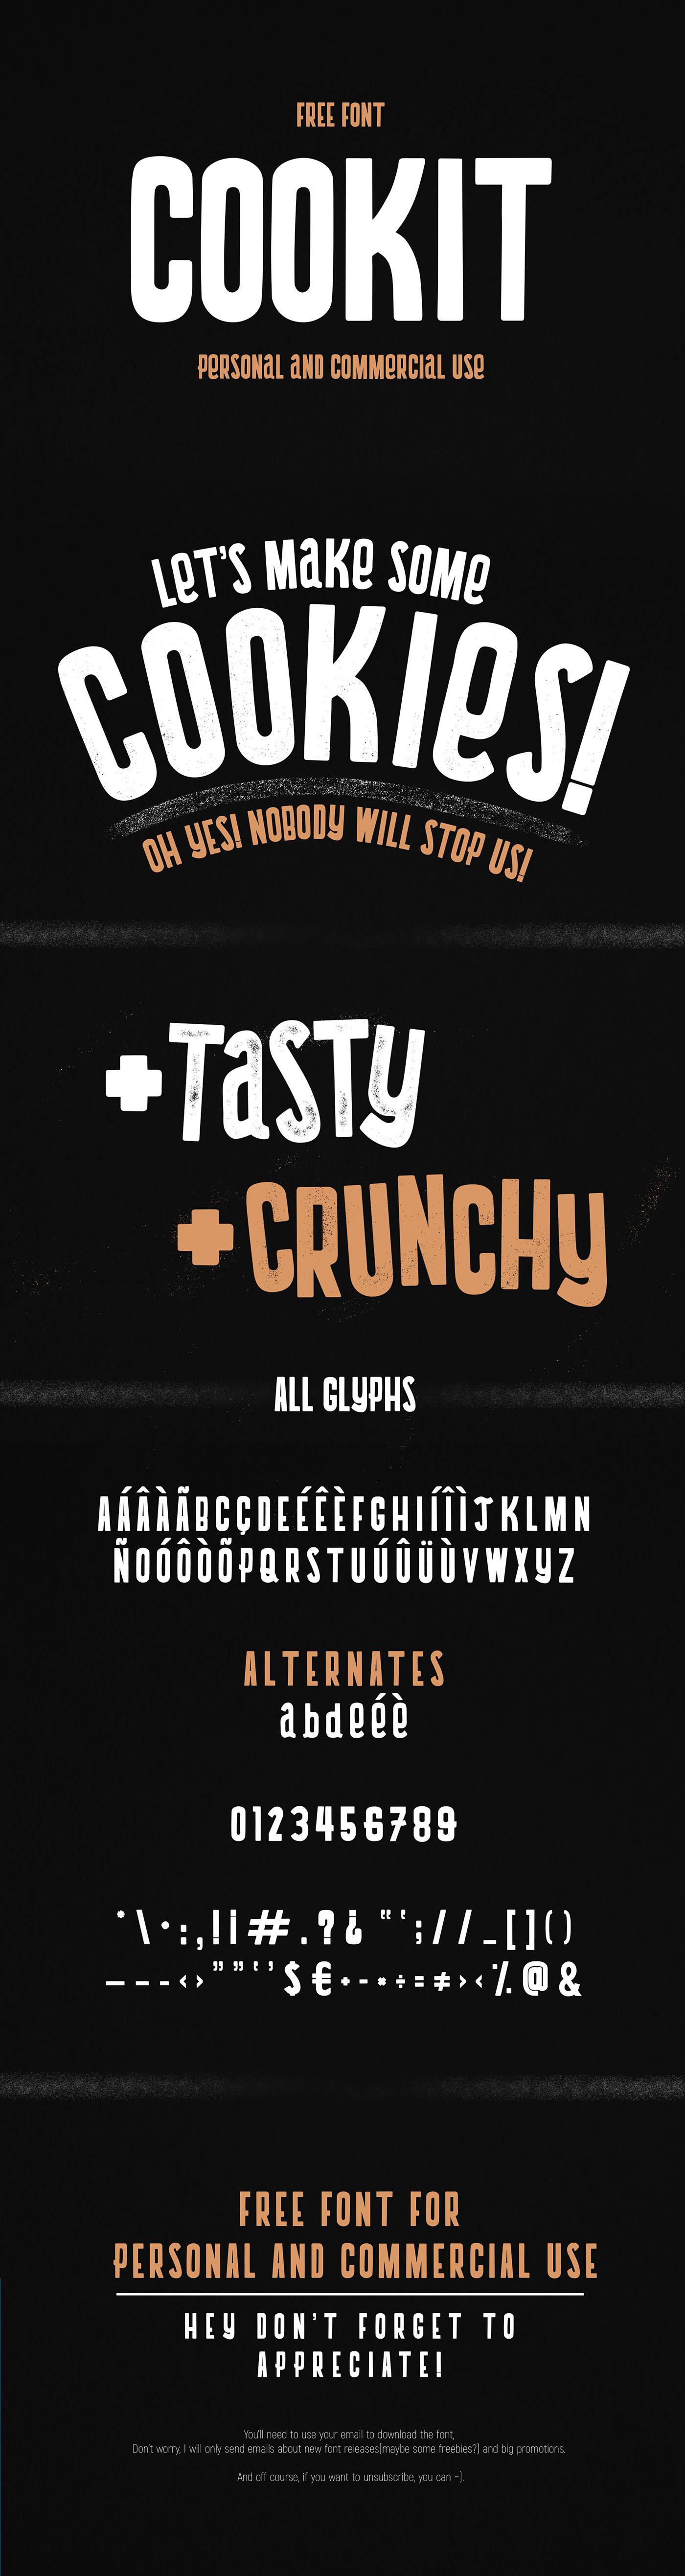 free font Display Fun kids child allcaps Food  typography   type design